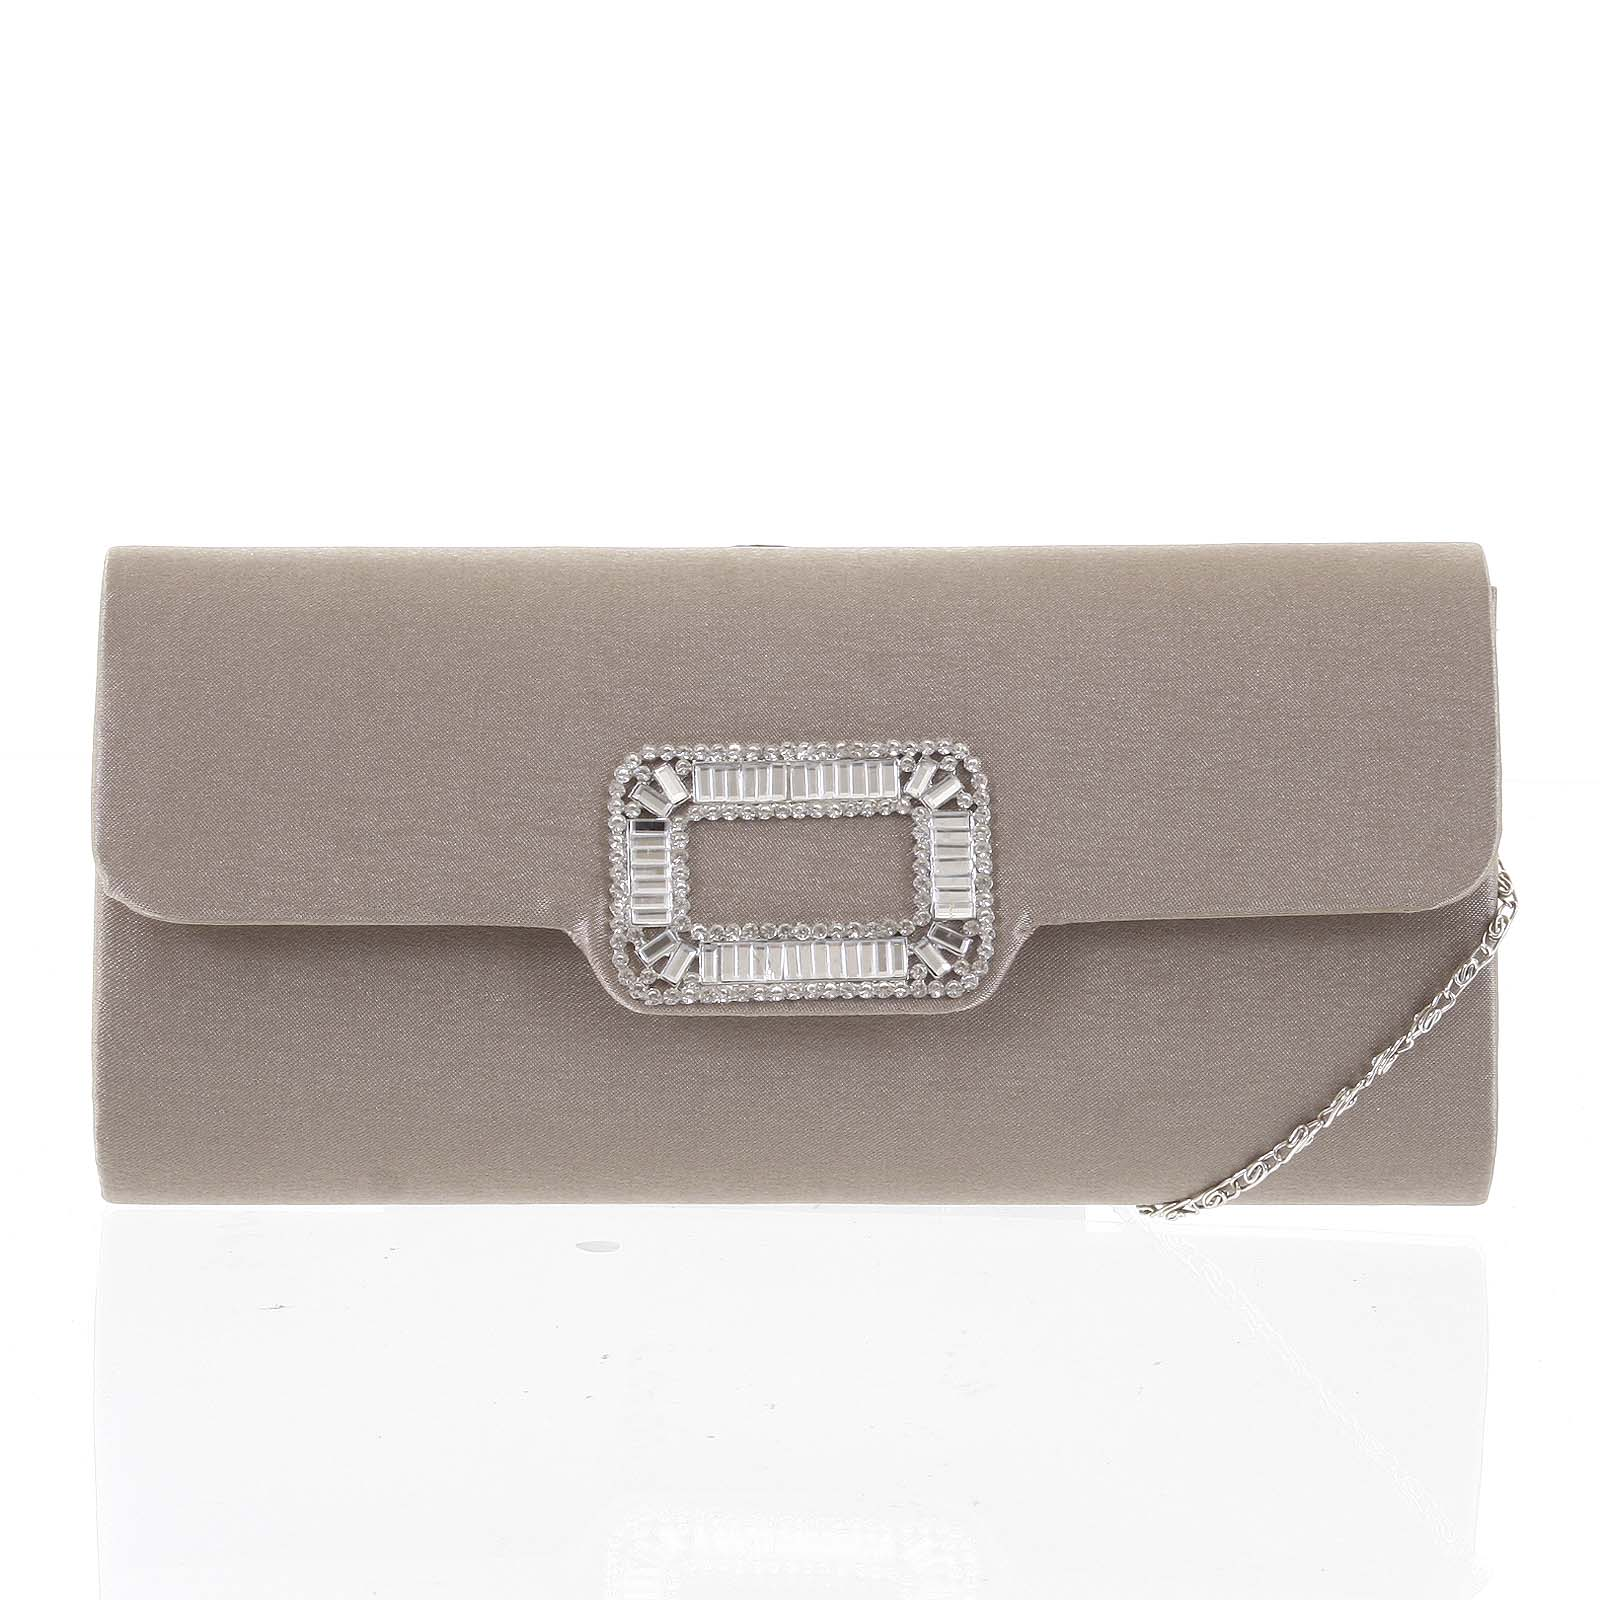 Stredná saténová listová kabelka khaki - Delami Santen